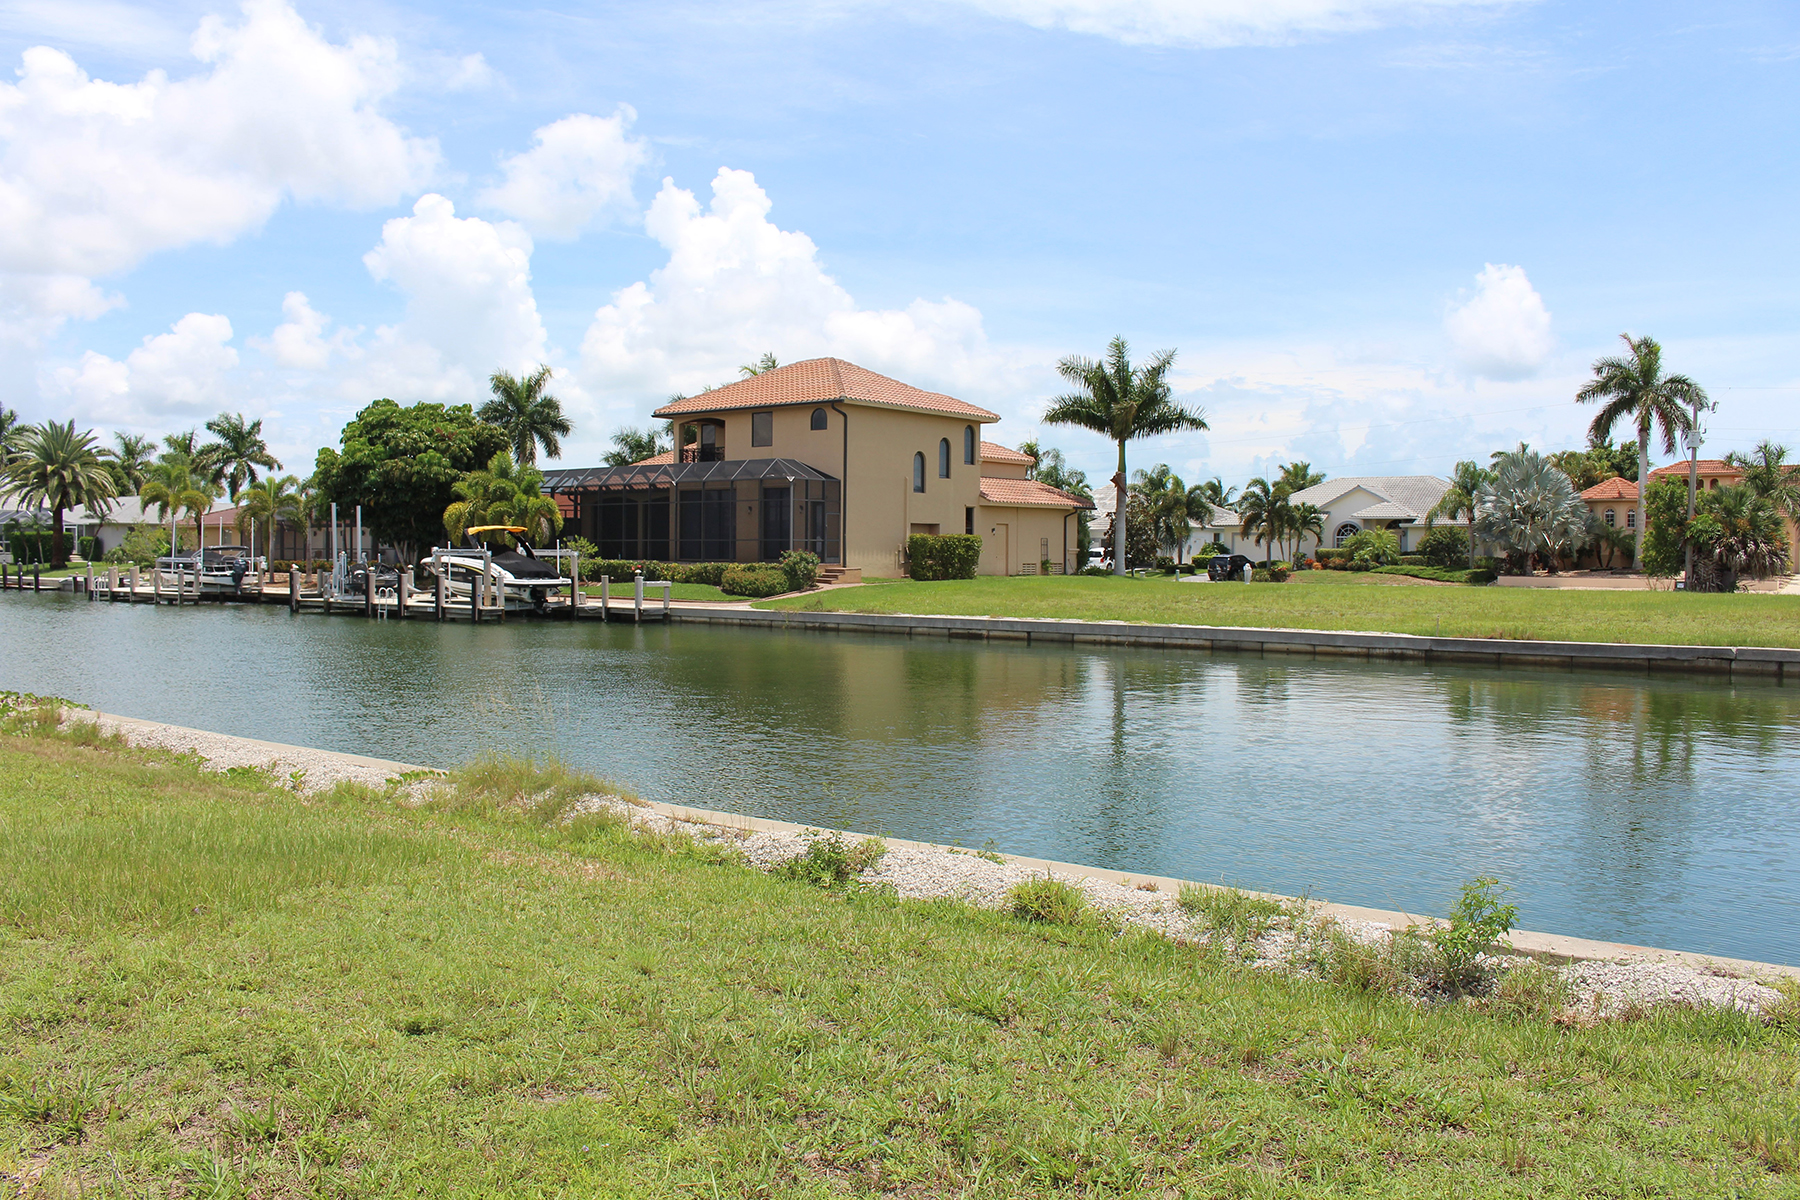 土地 为 销售 在 MARCO ISLAND - DILL COURT 1065 Dill Ct Marco Island, 佛罗里达州 34145 美国